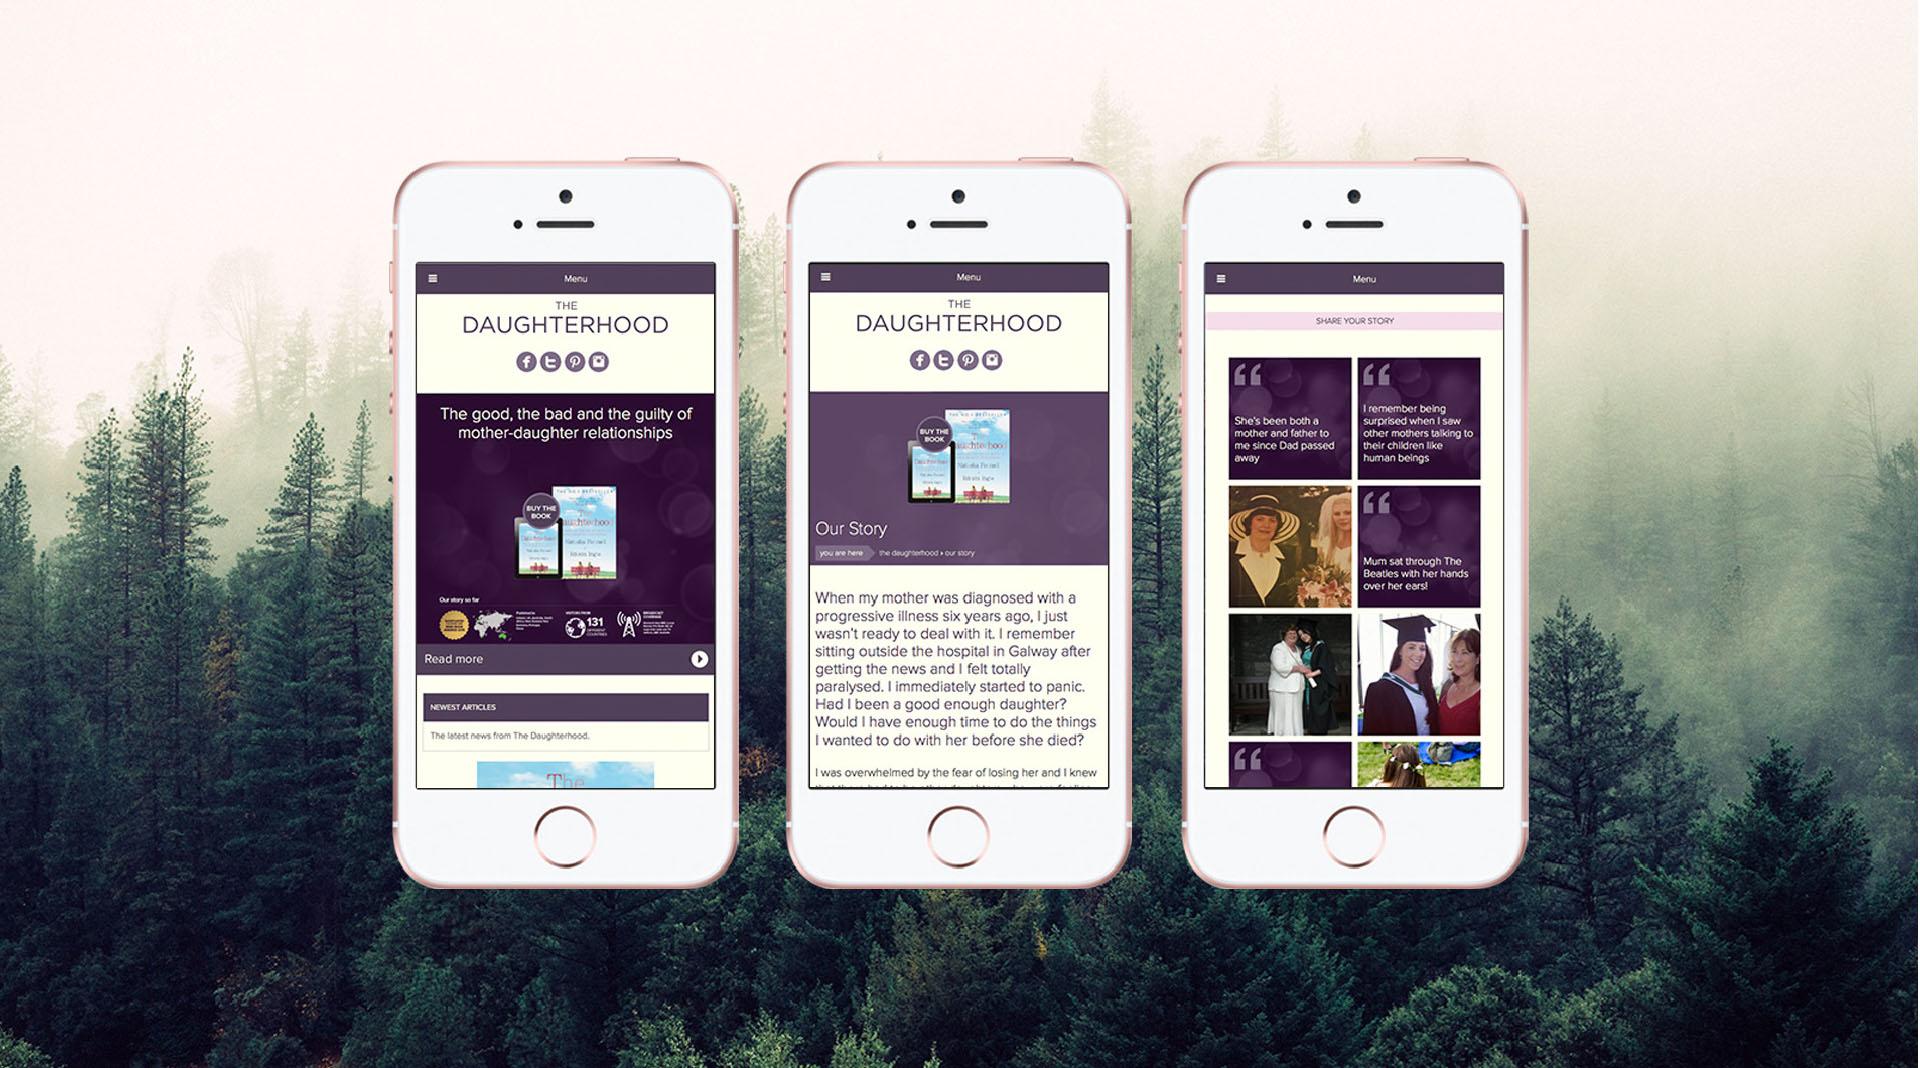 The Daughterhood Mobile Website Examples